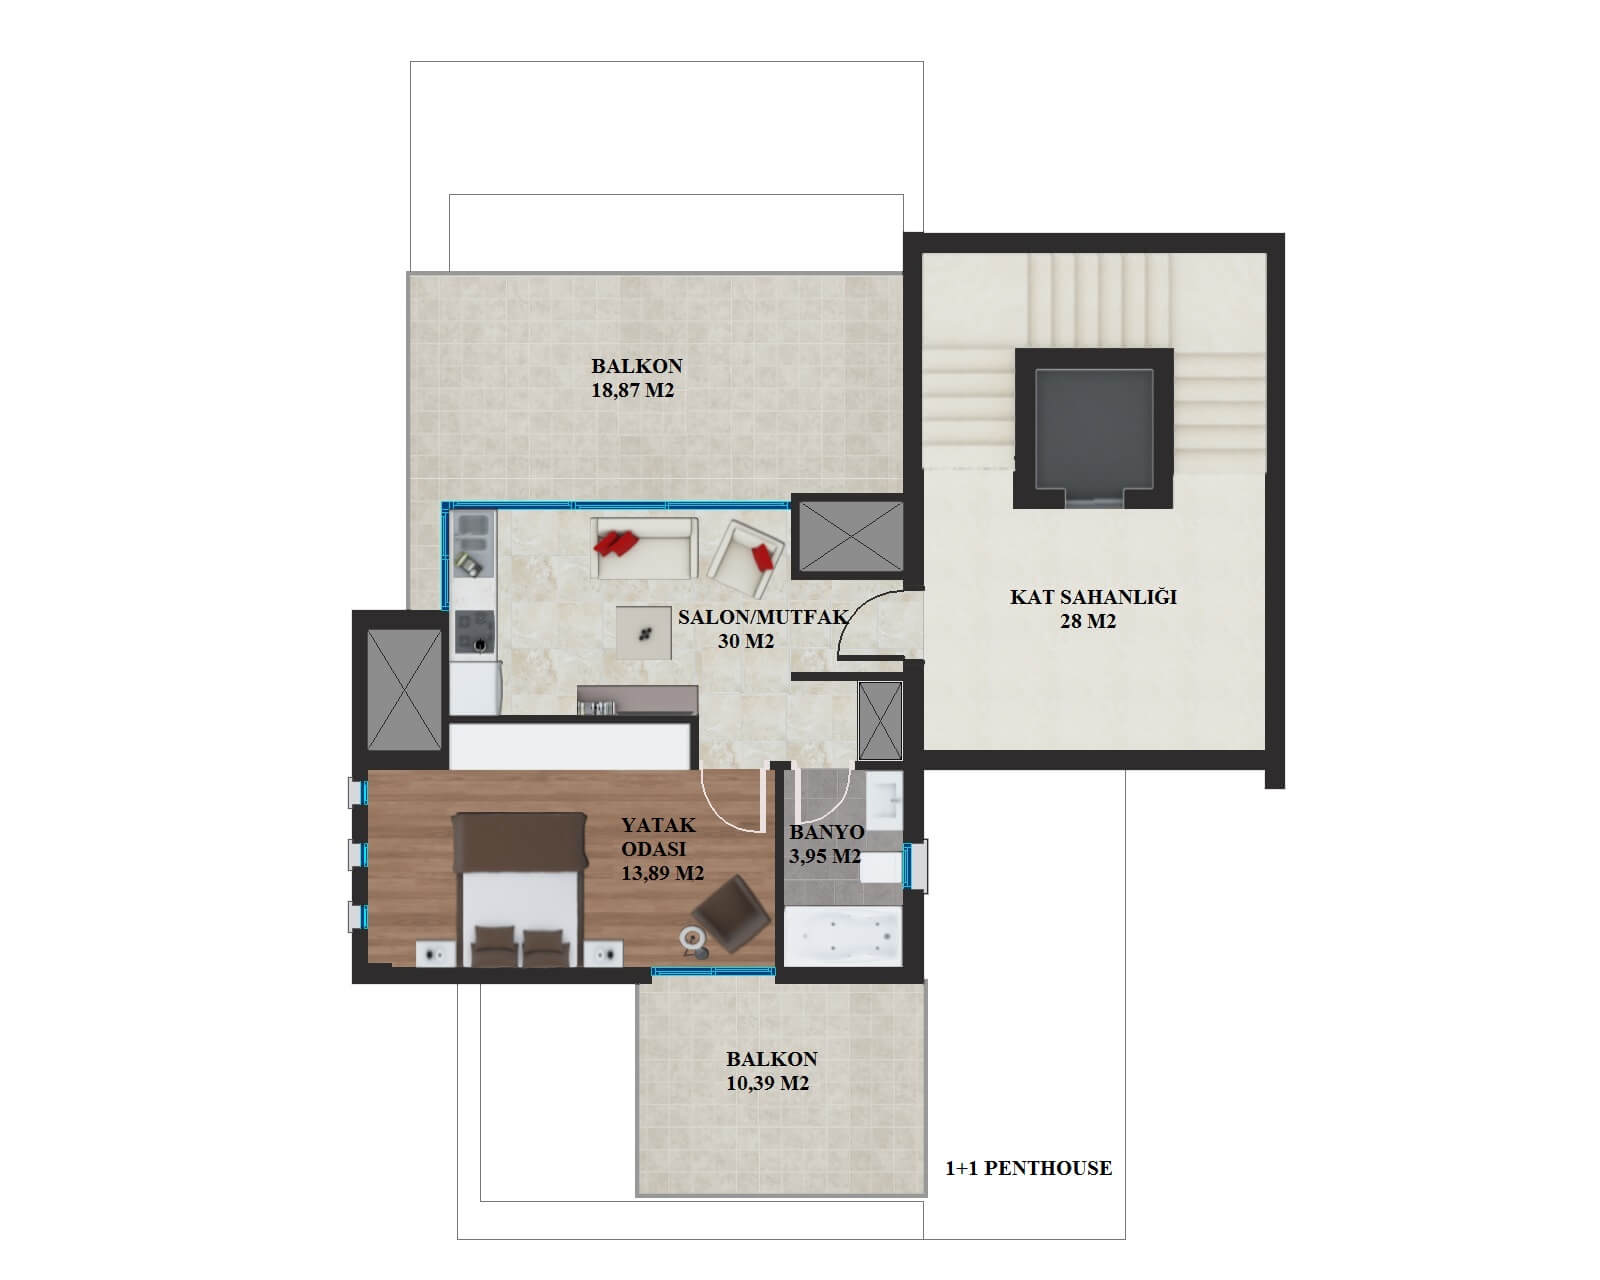 1+1 penthouse